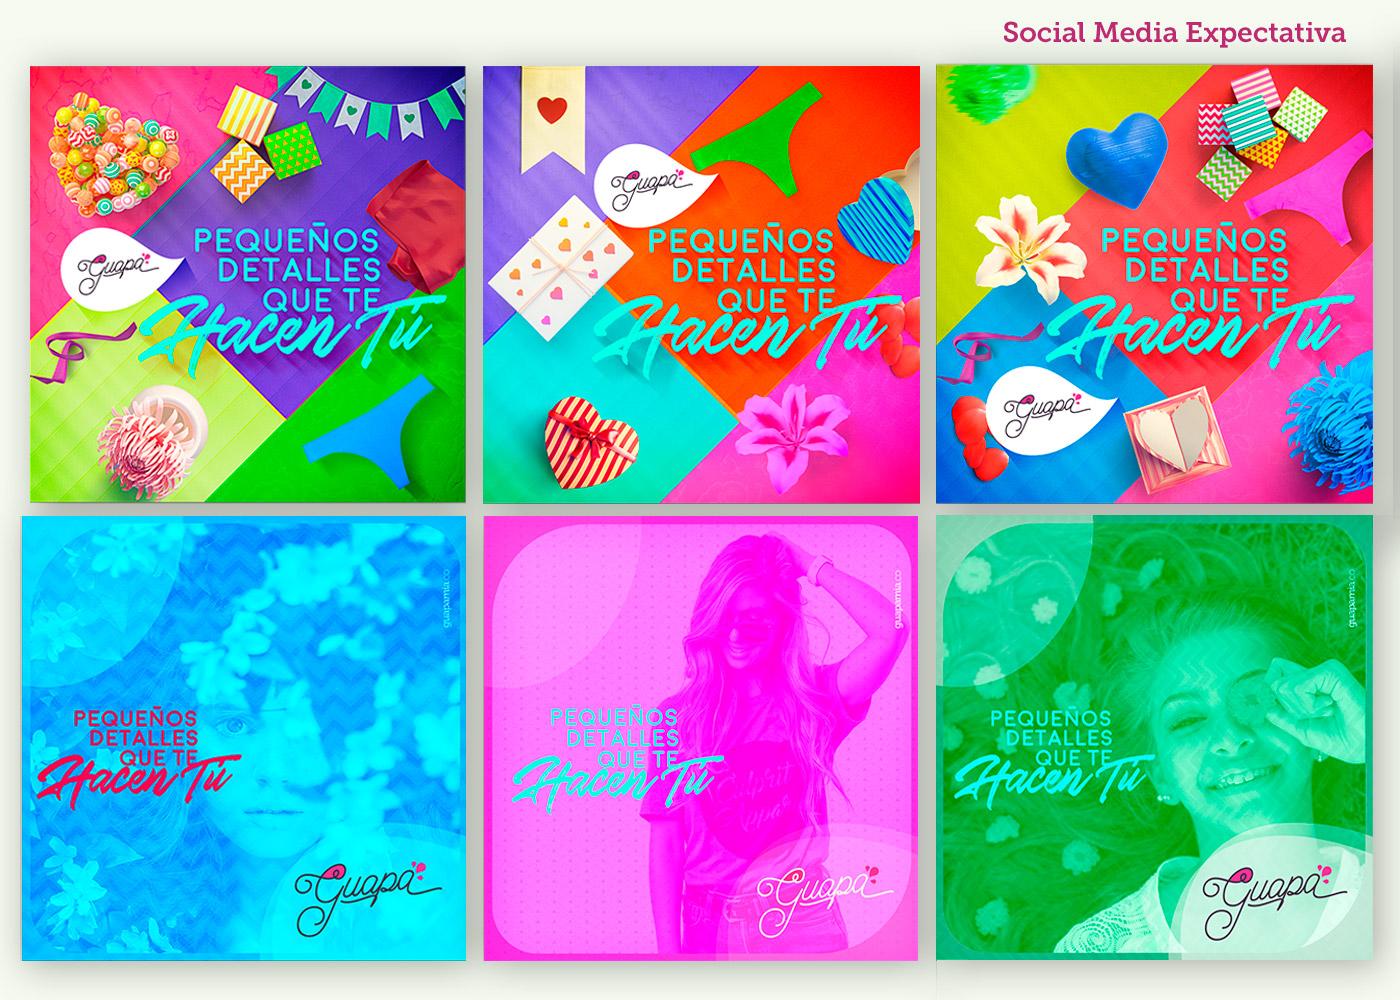 guapa-social-media1